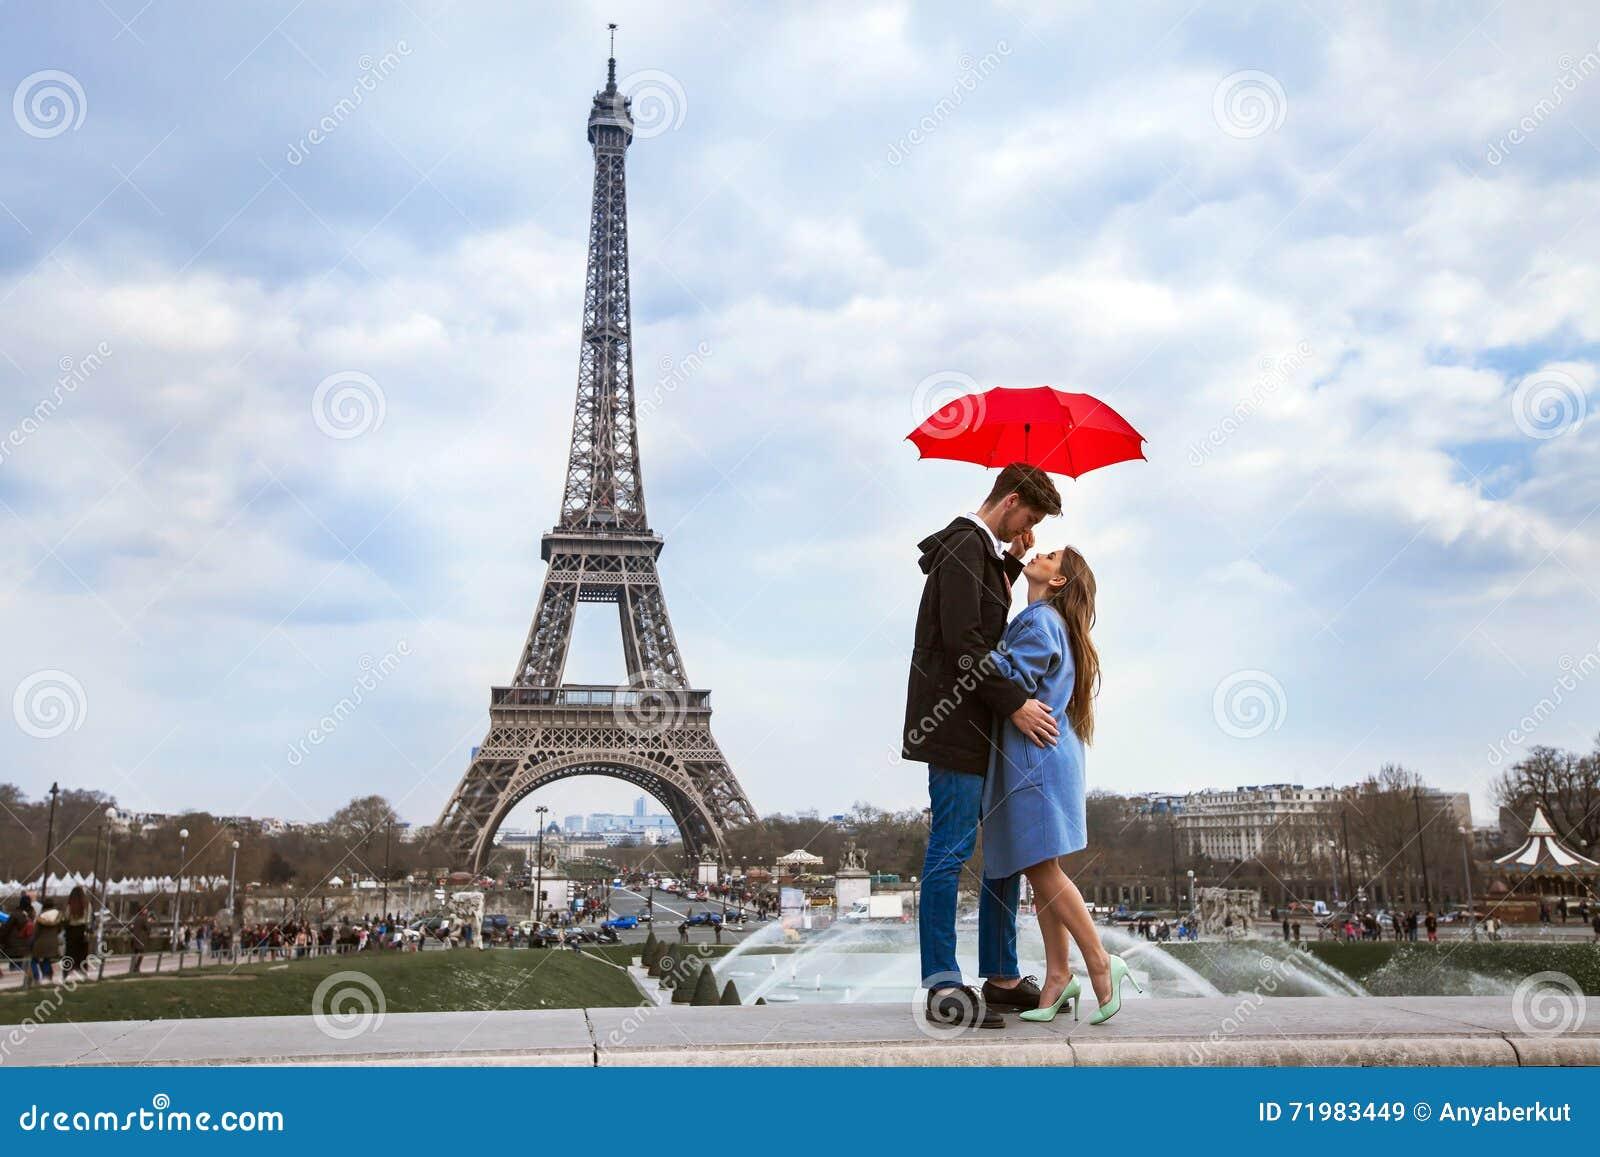 Beautiful couple with umbrella near Eiffel Tower